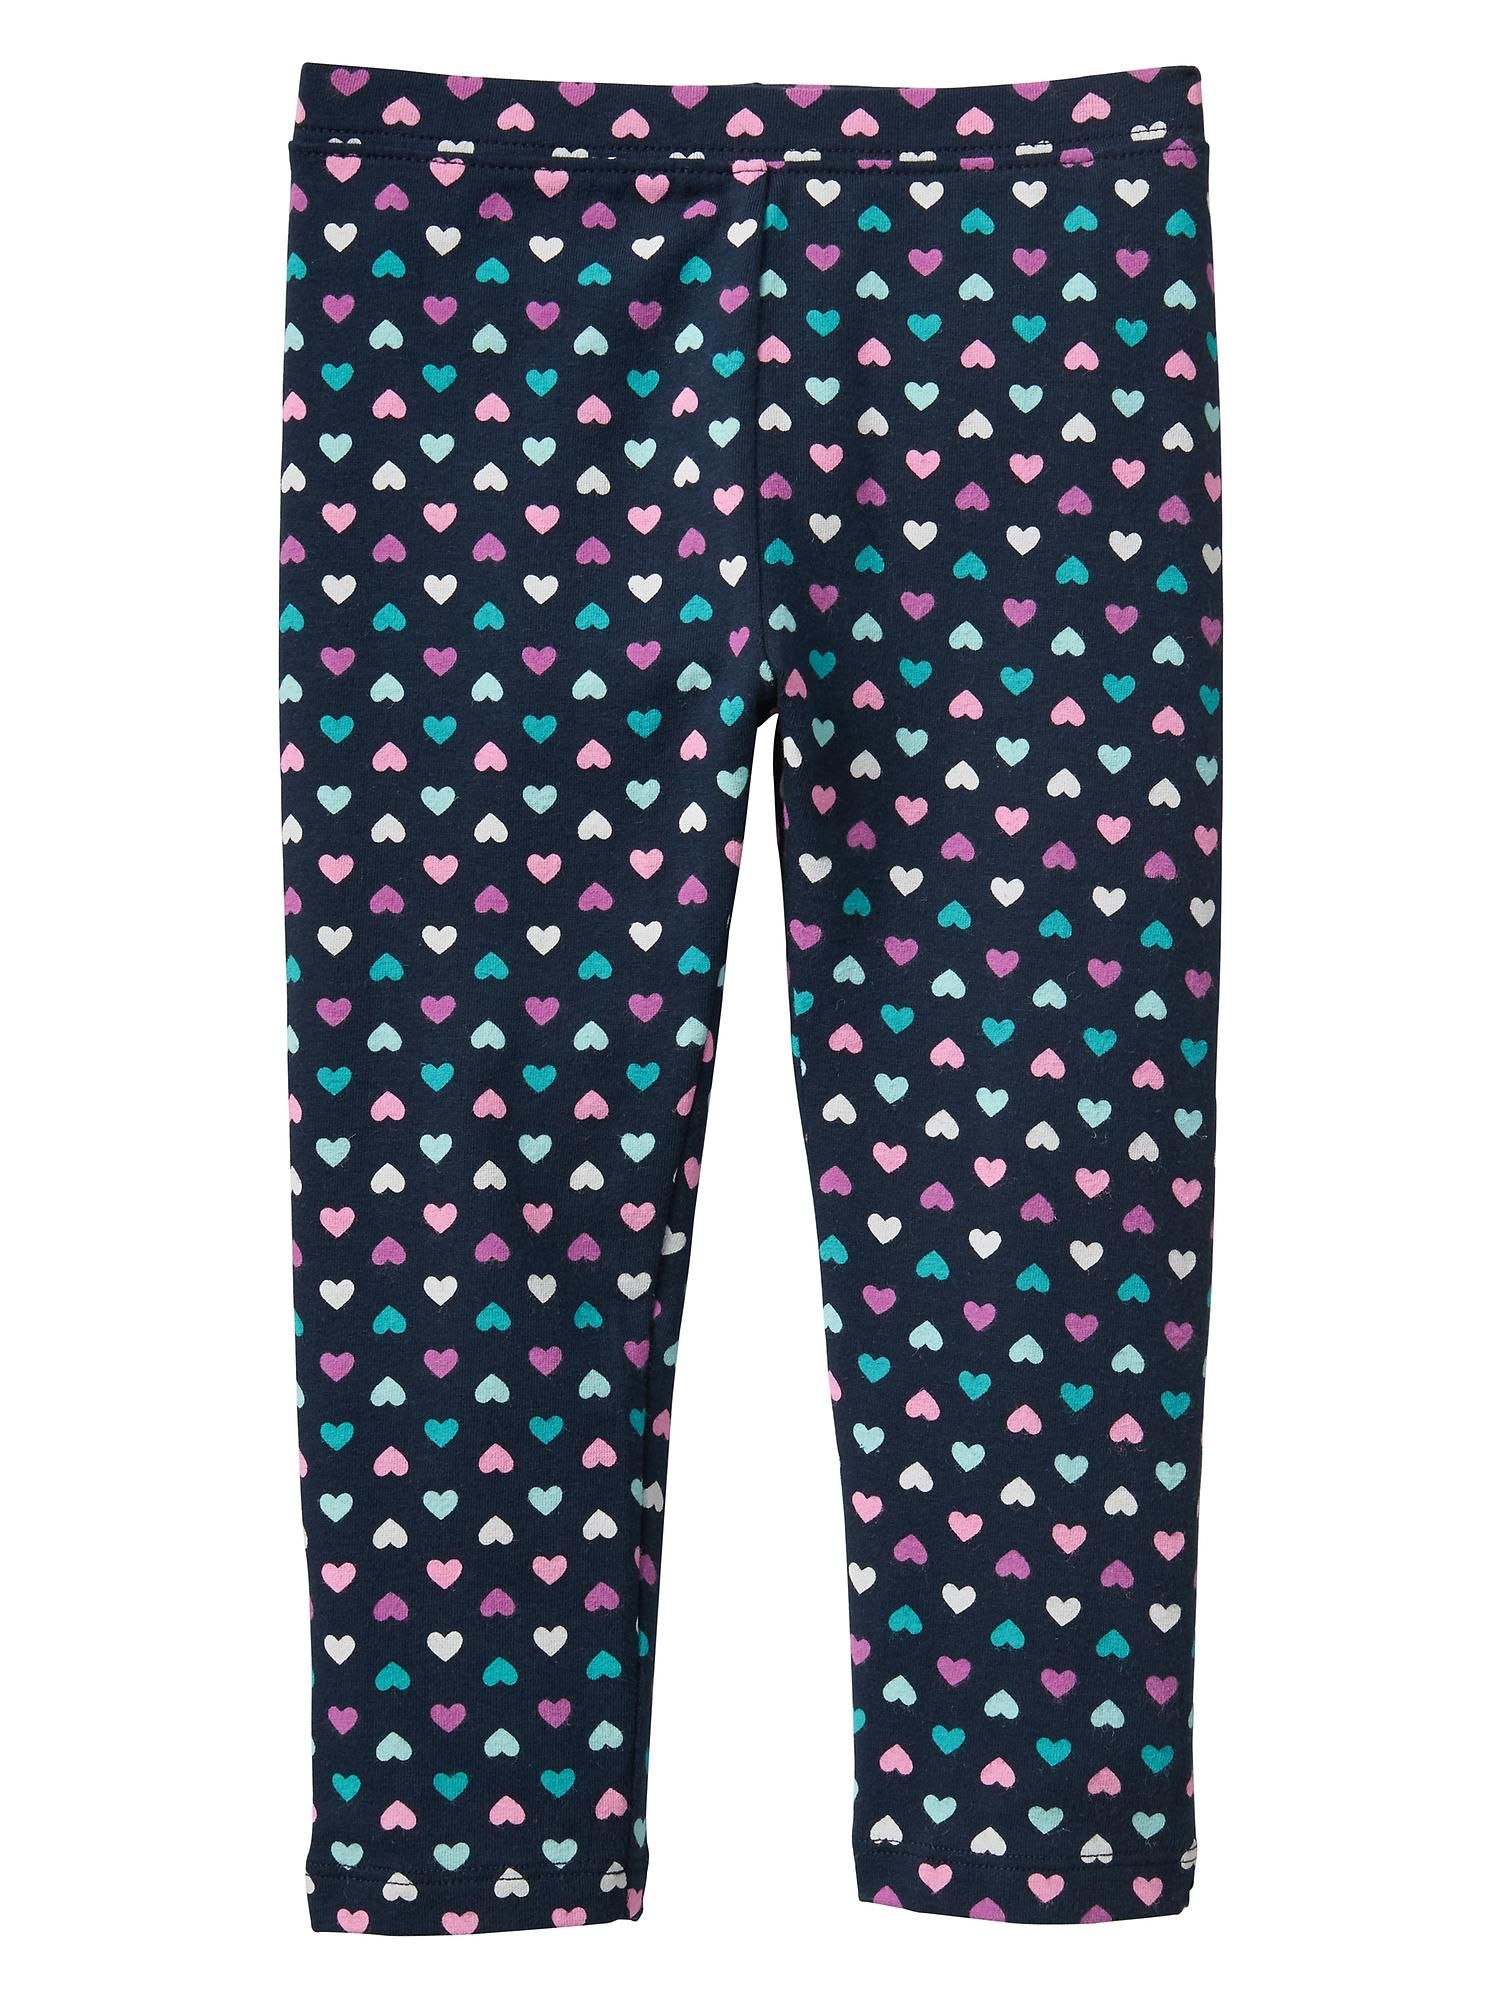 b7aac64ea Leggings by Gap Factory 6 months-5 yrs | Girls Pants, Shorts ...